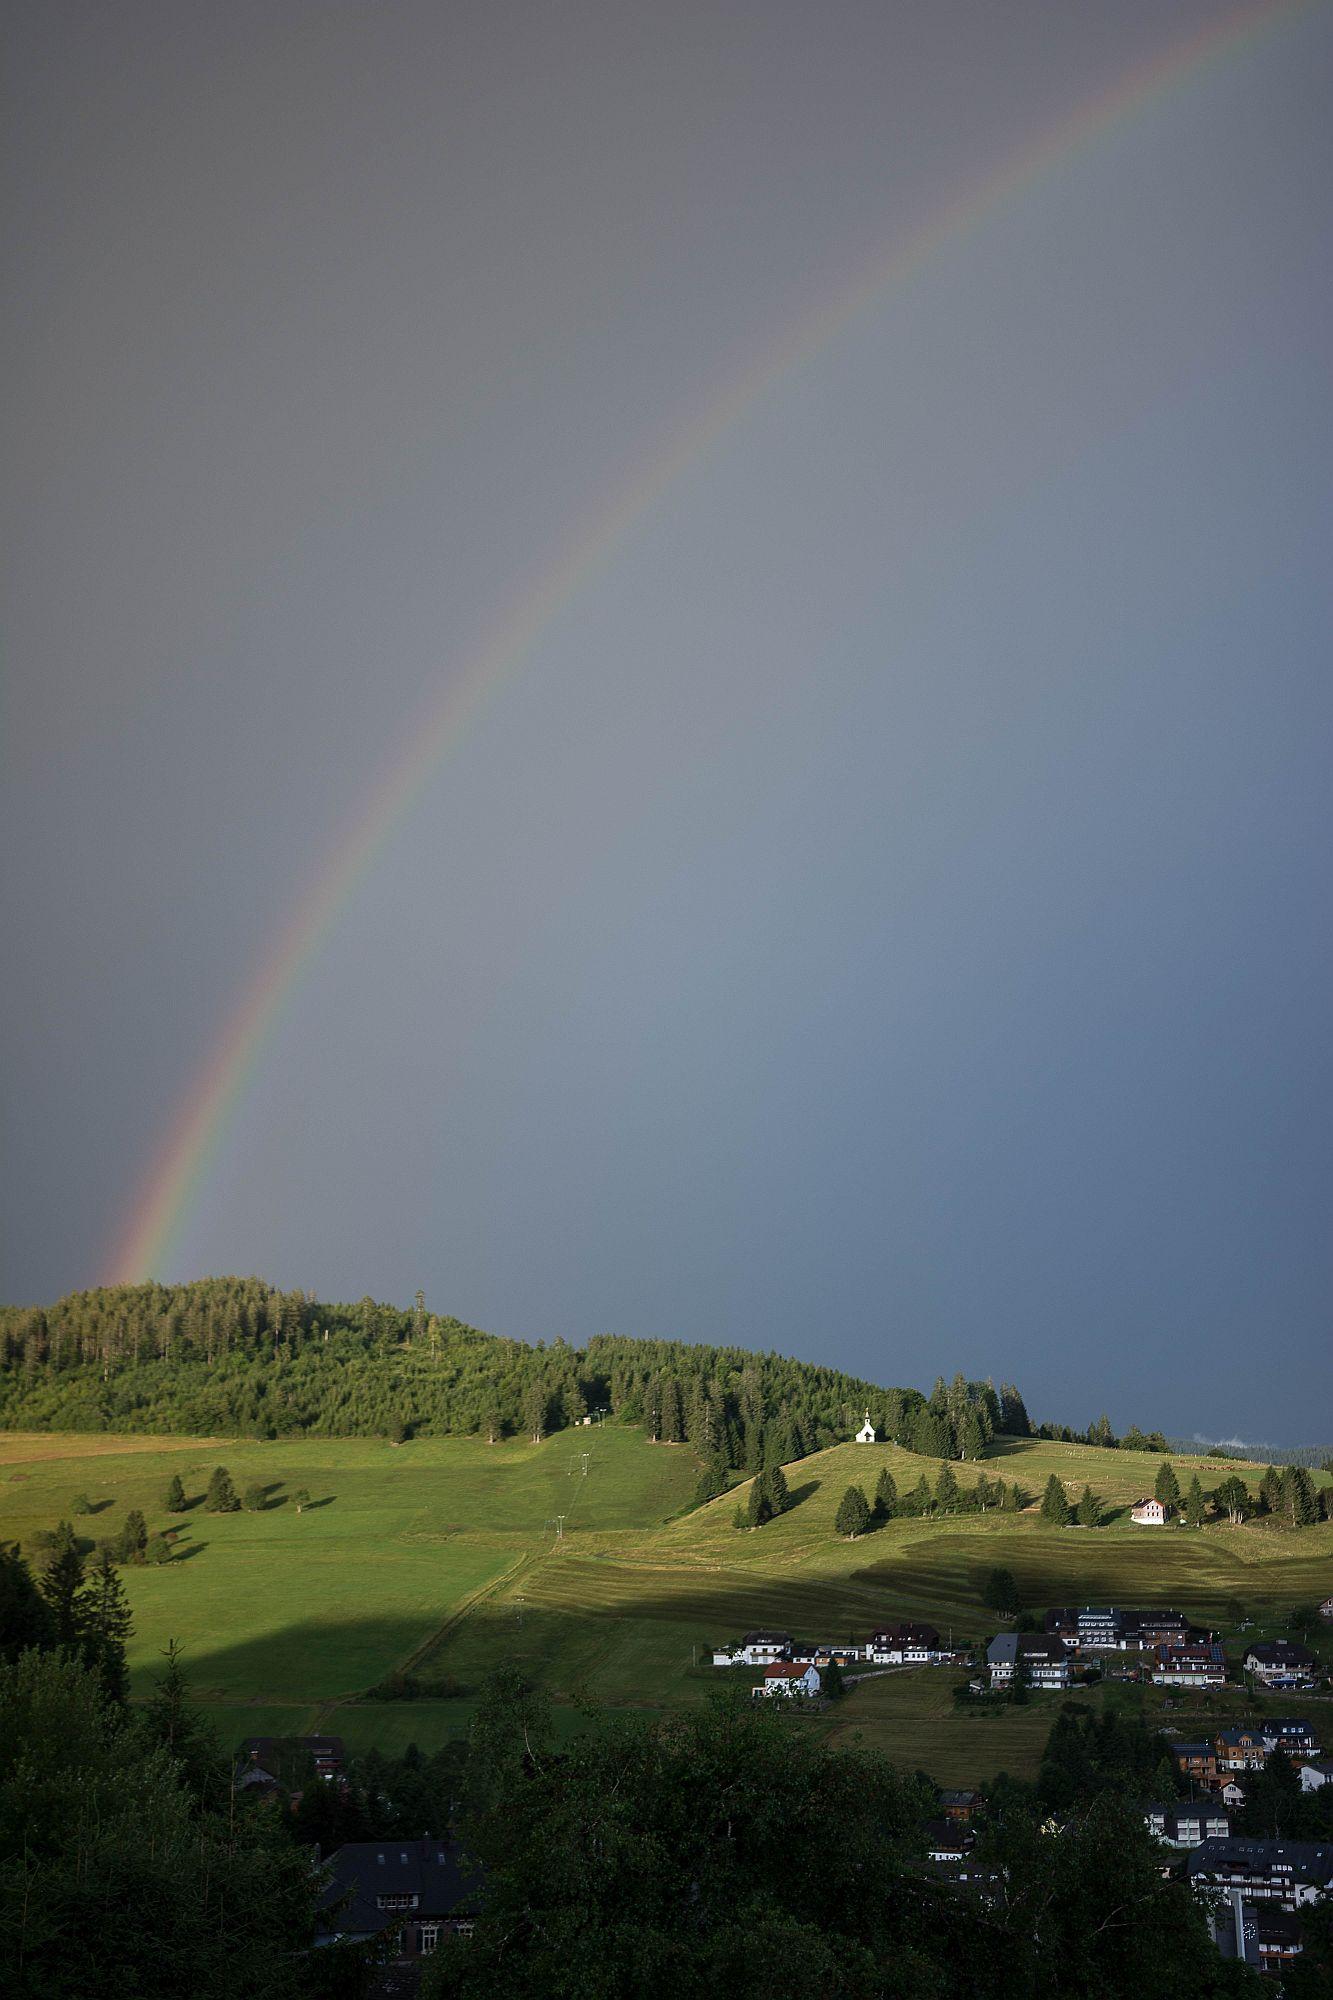 Regenbogen, Blick vom Balkon